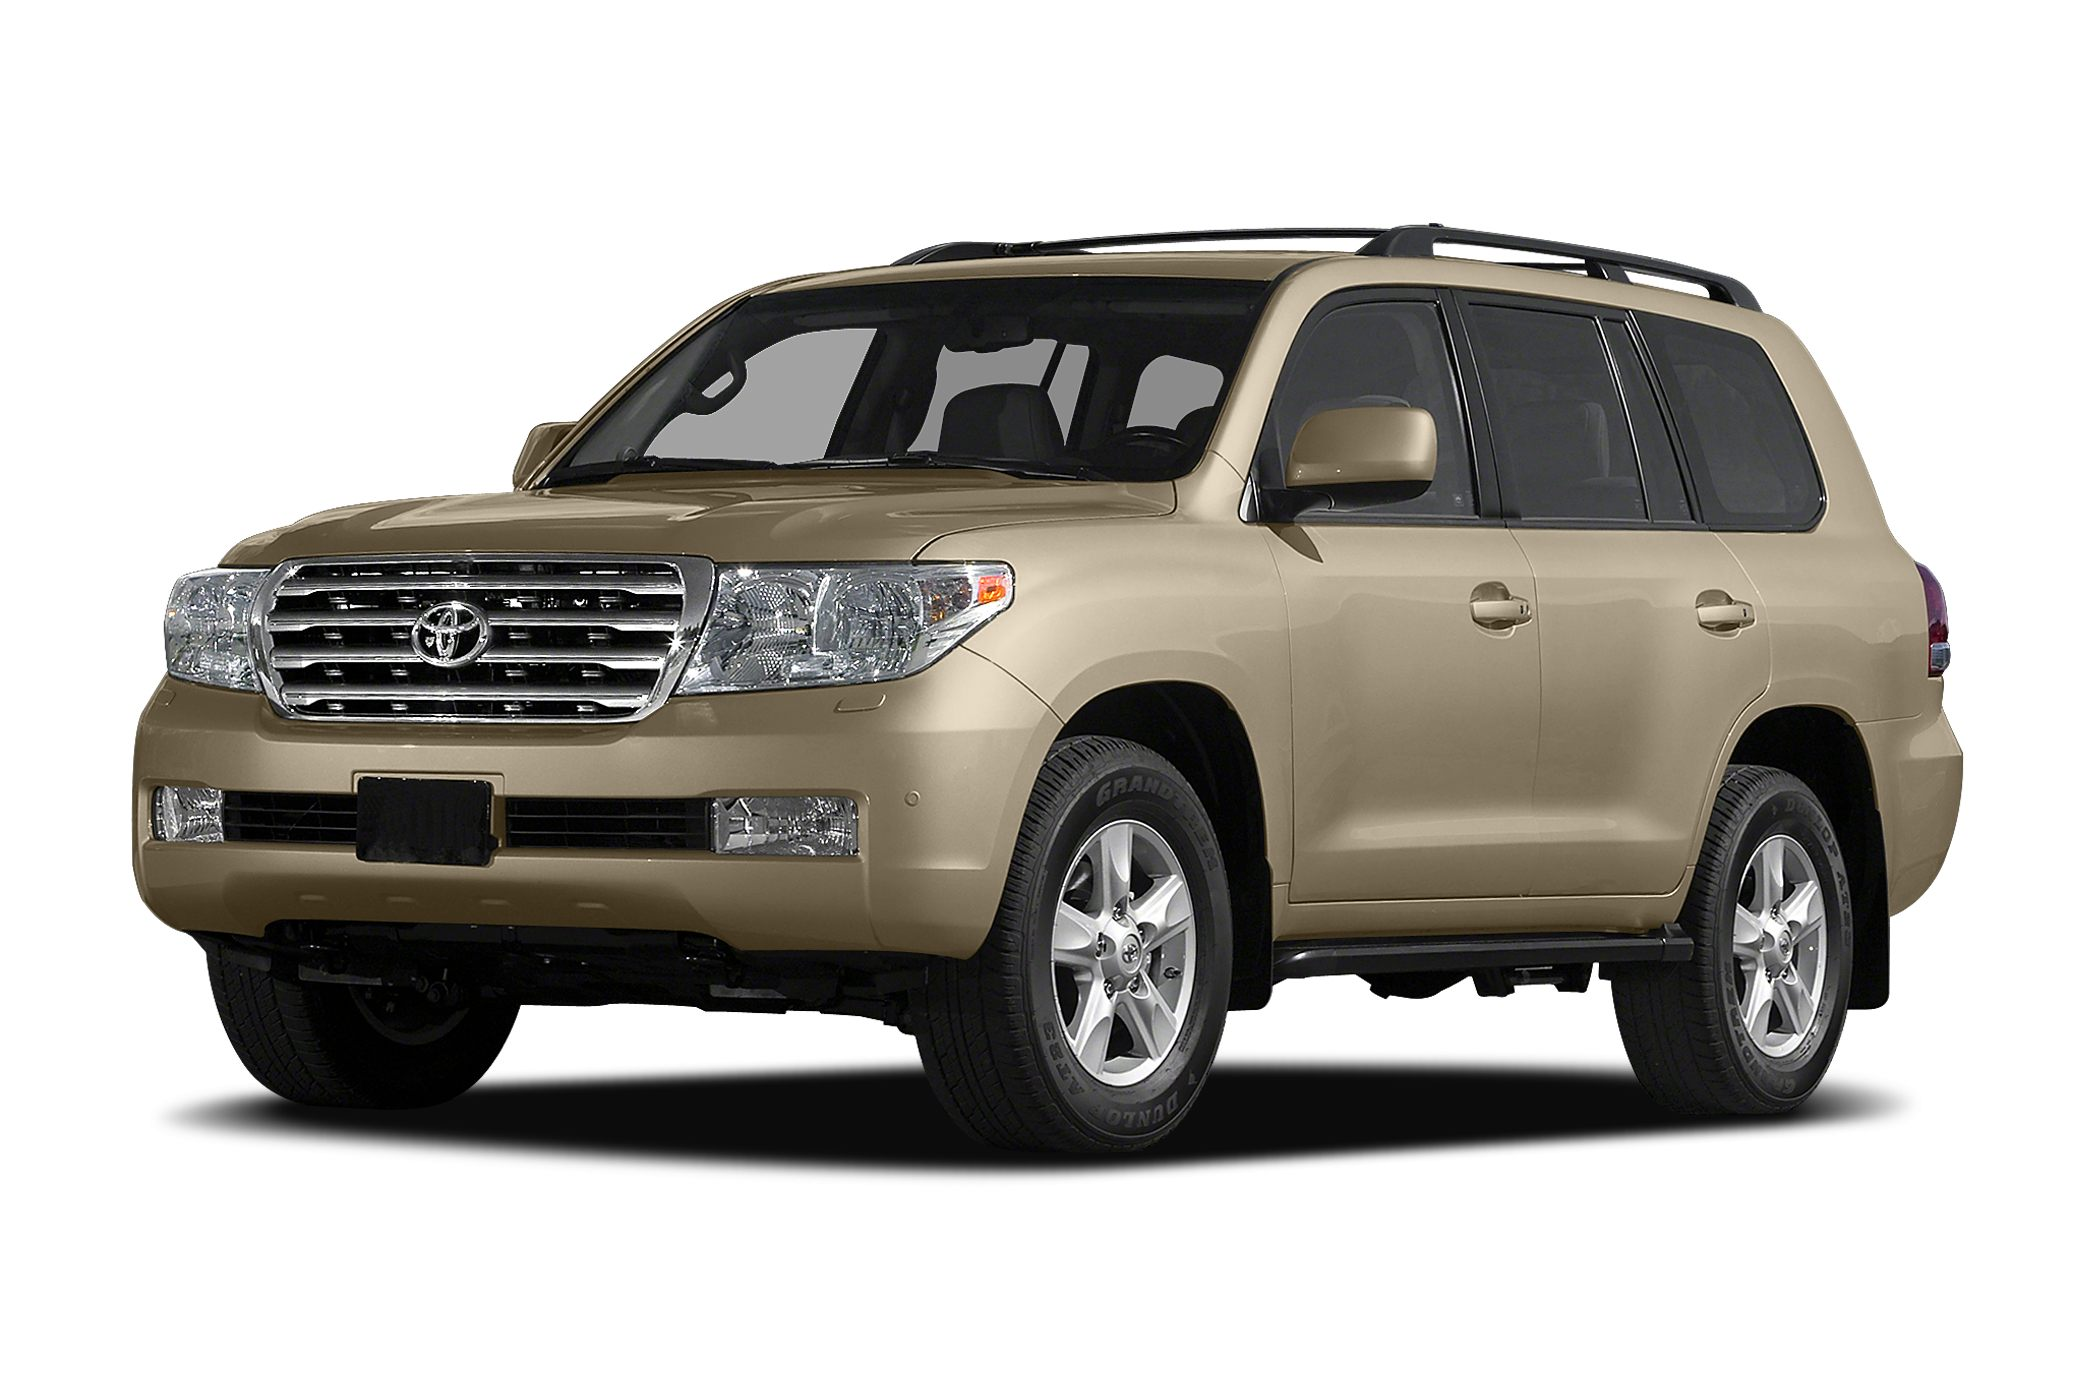 Kelebihan Kekurangan Toyota Land Cruiser 2011 Murah Berkualitas